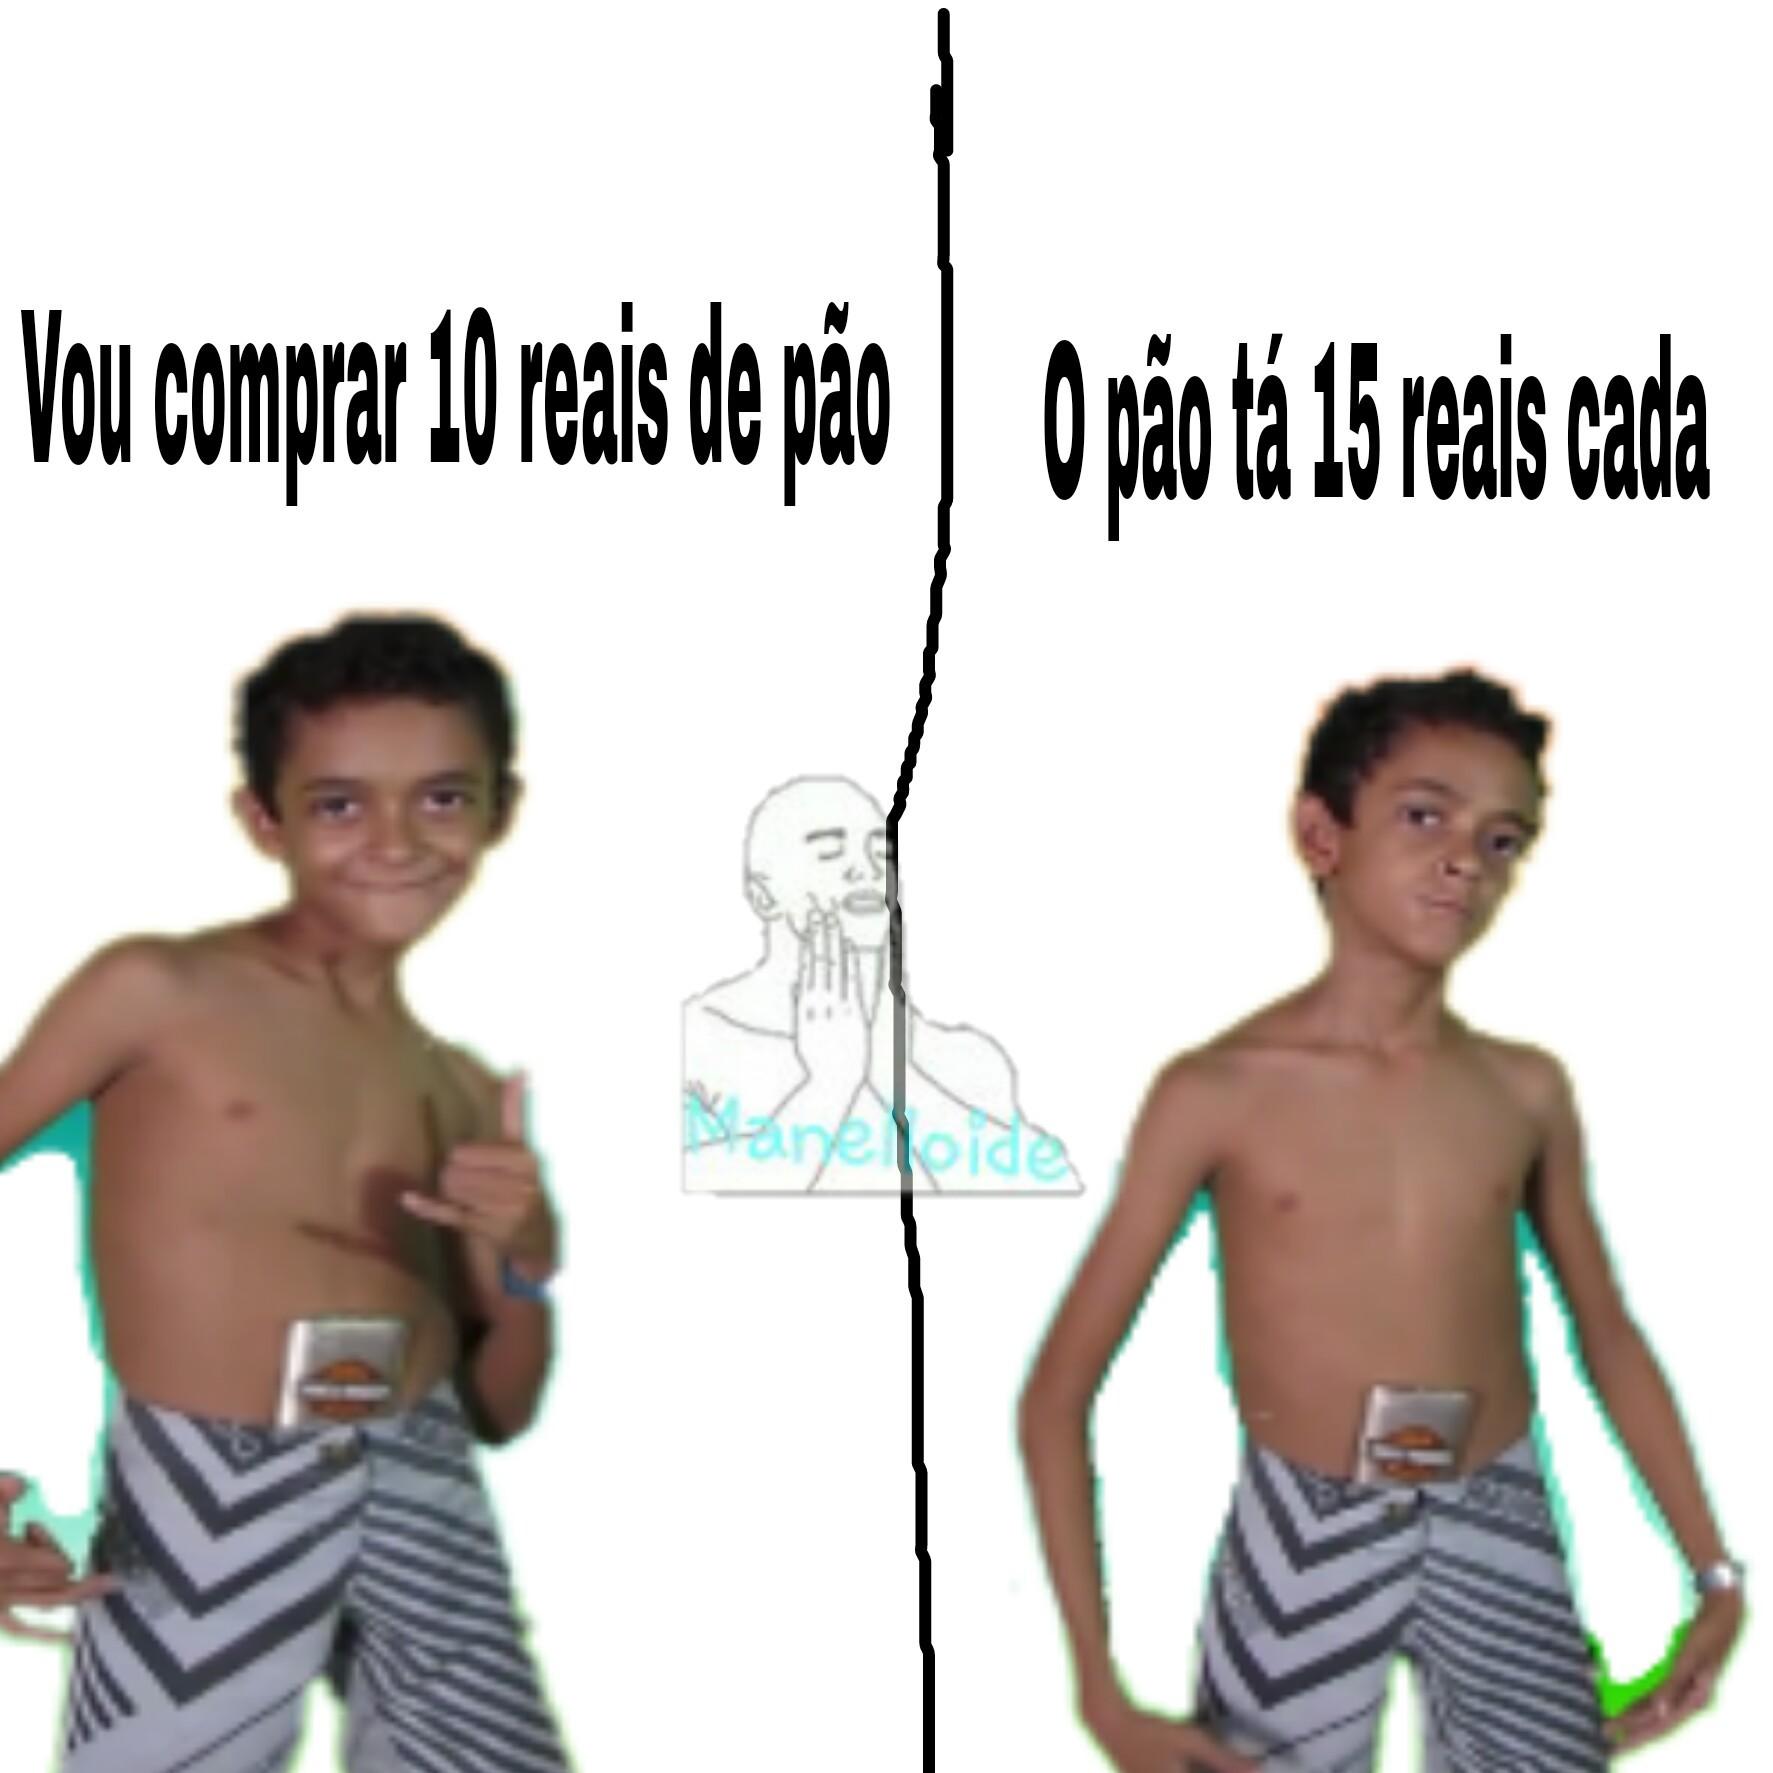 TA PORRA - meme